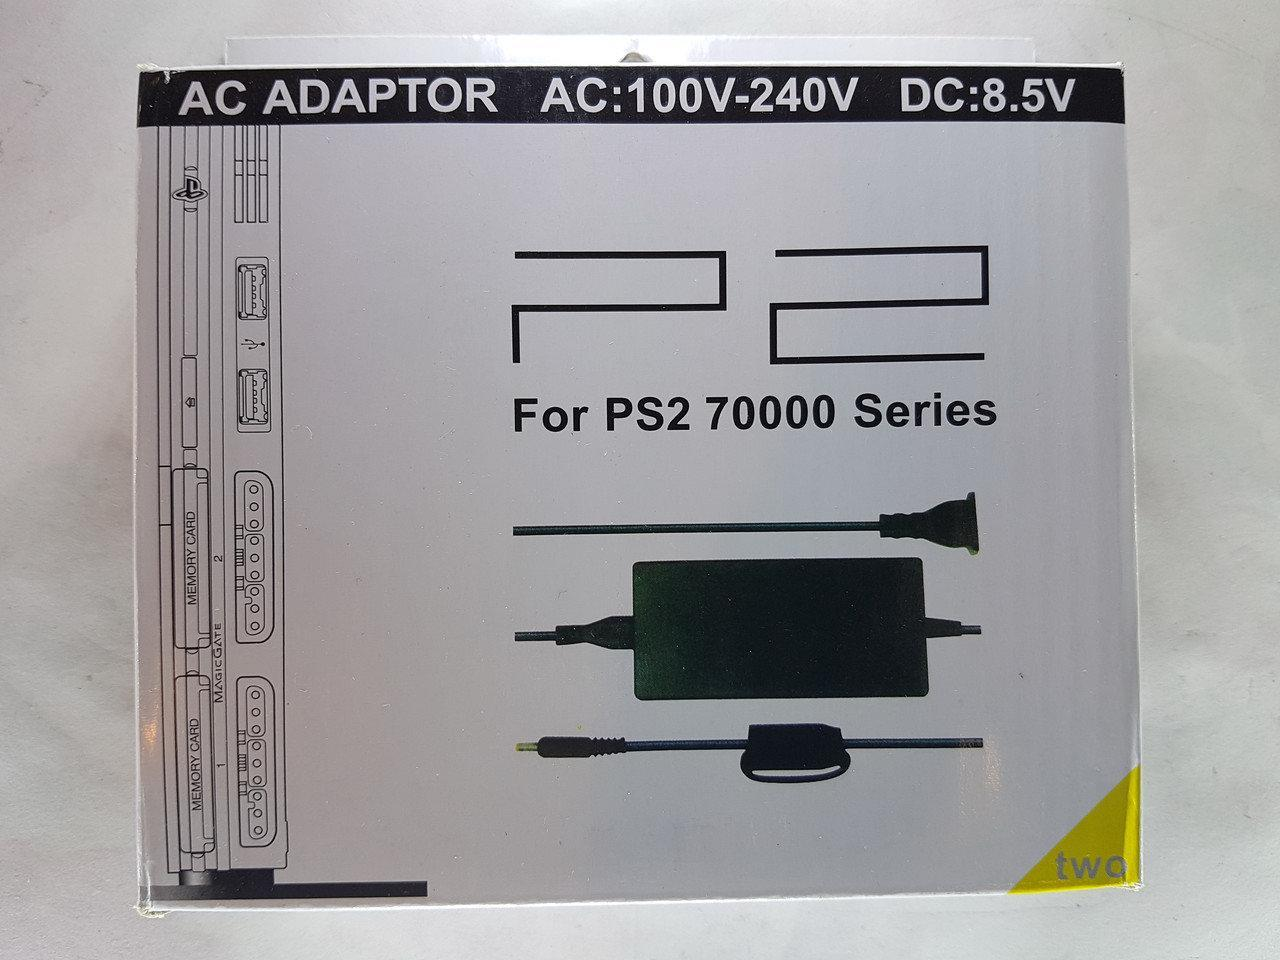 Блок питания для SONY PLAYSTATION.Адаптер питания,зарядное устройство кабель шнур для Sony PS2 70000